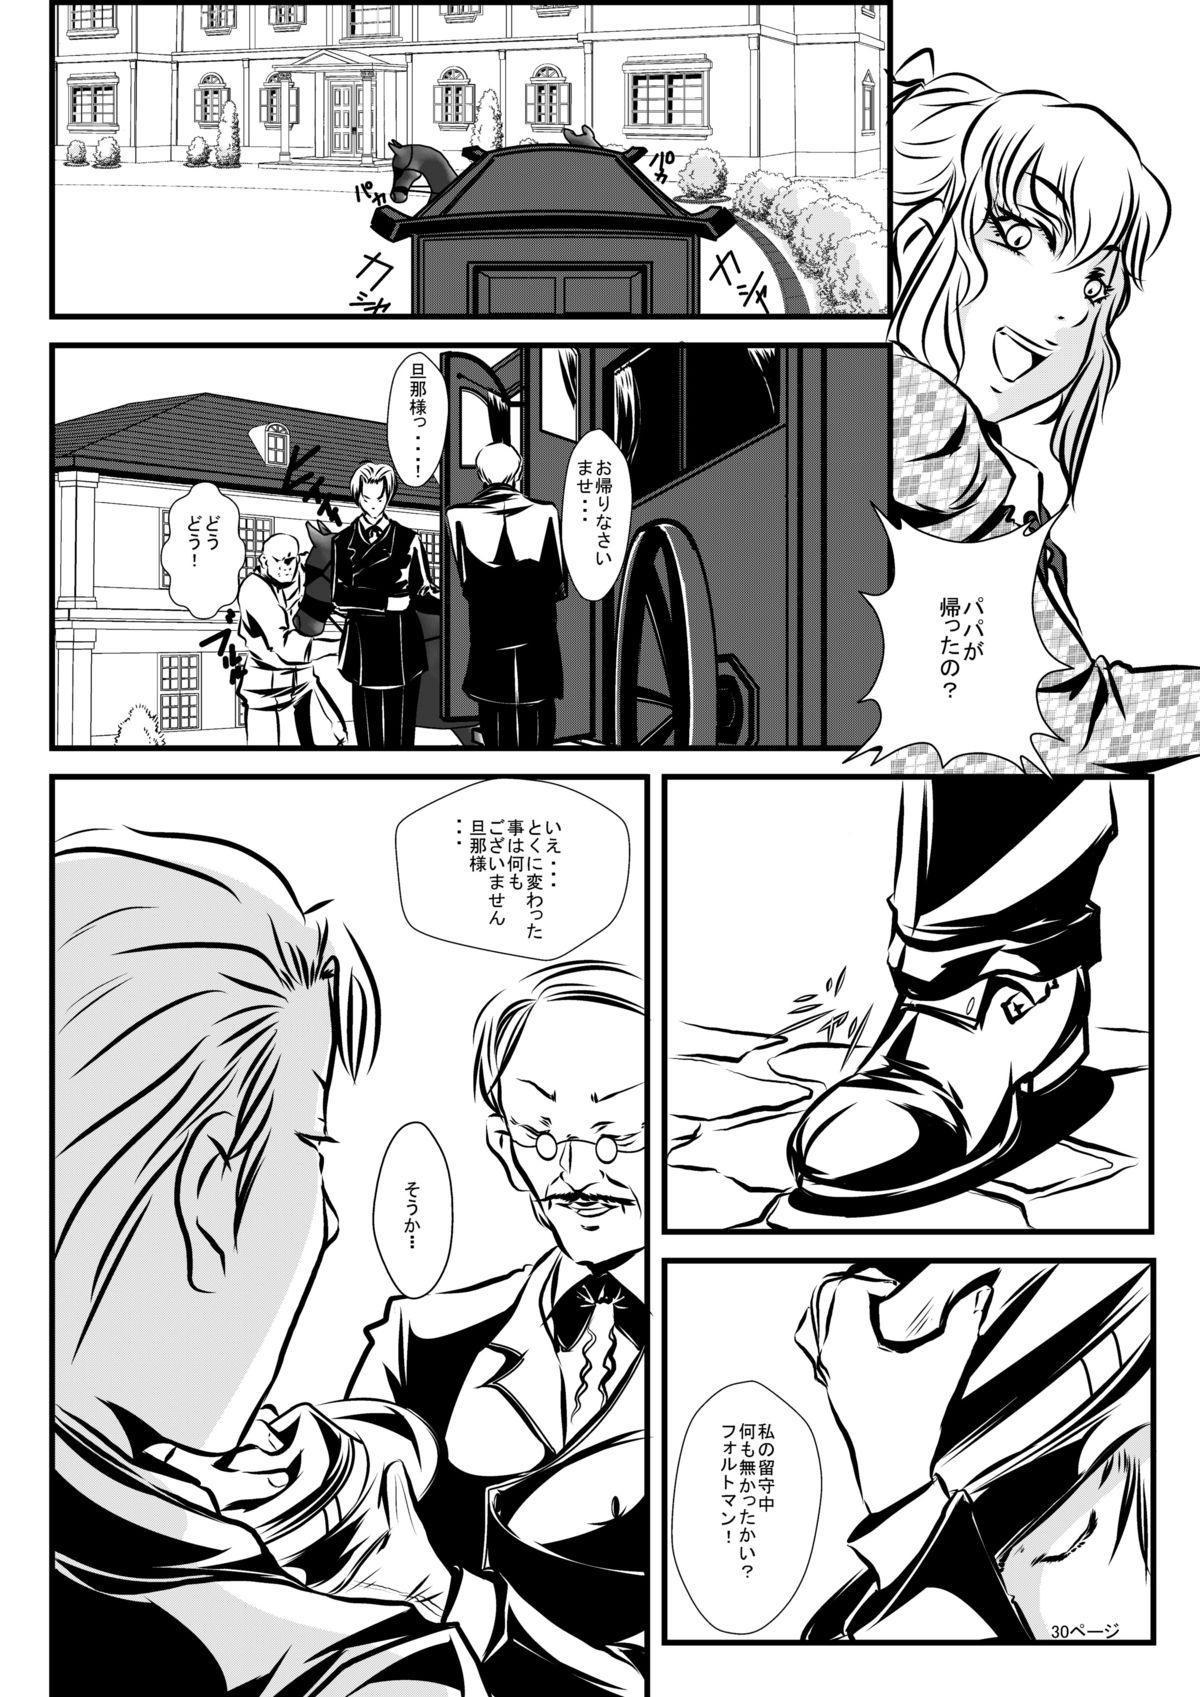 Loli Type no Jikkensitsu 28